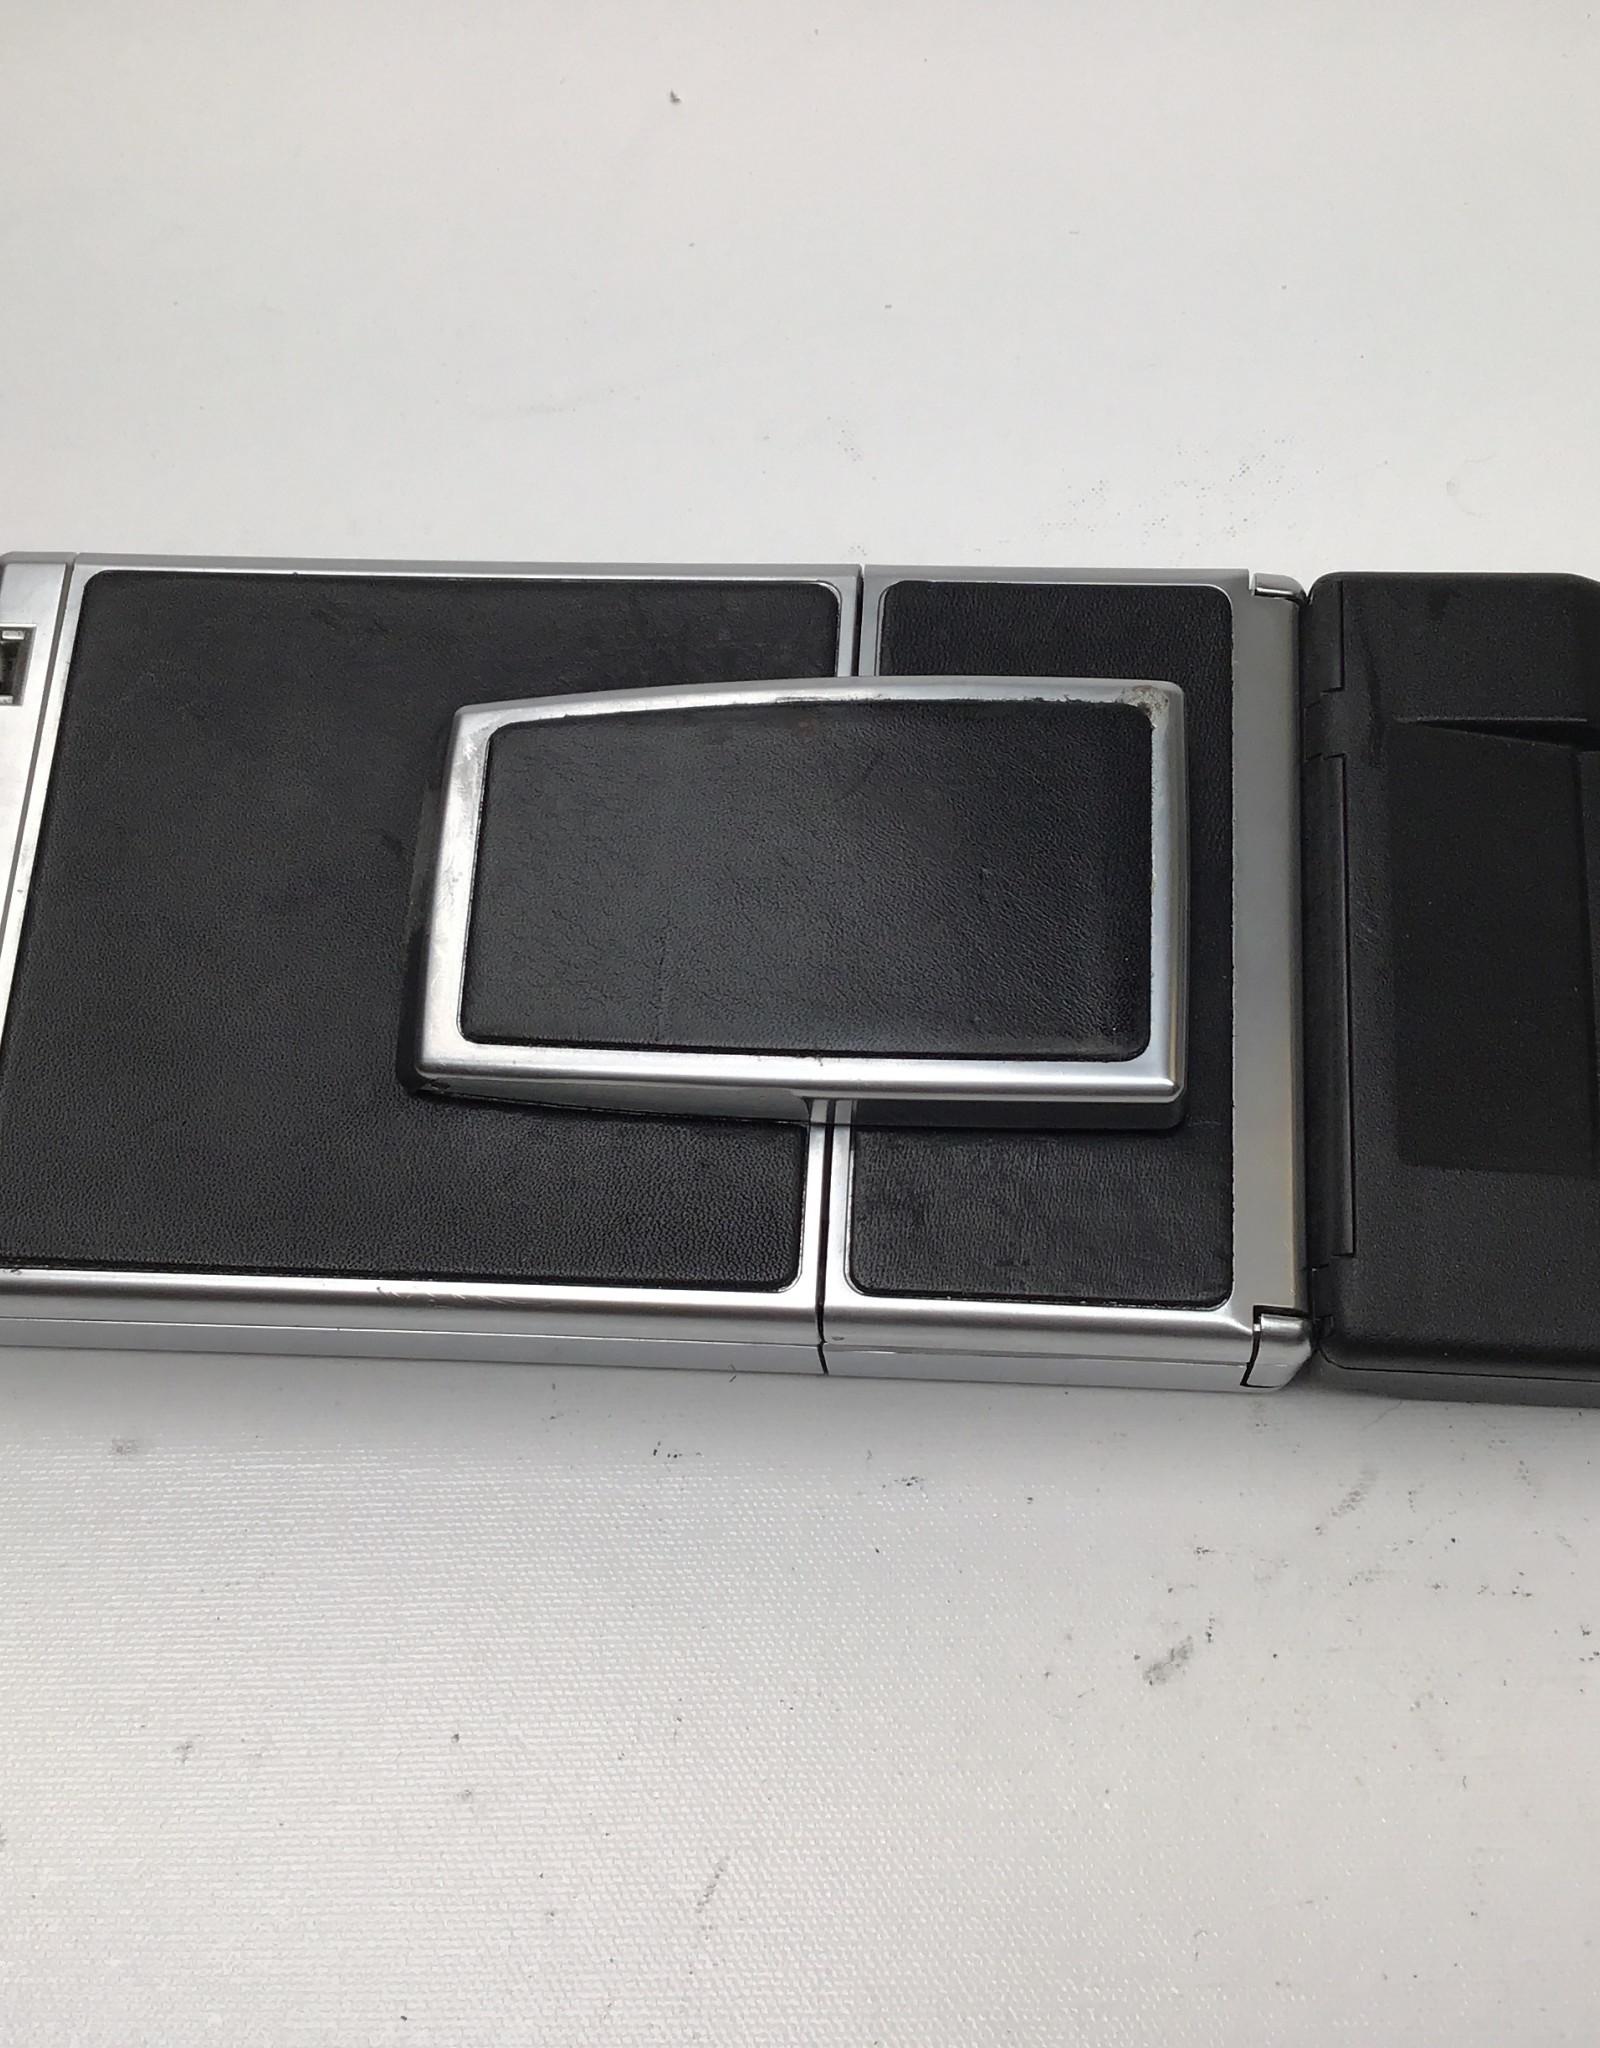 Polaroid SX-70 Sonar One Step Camera Used Fair